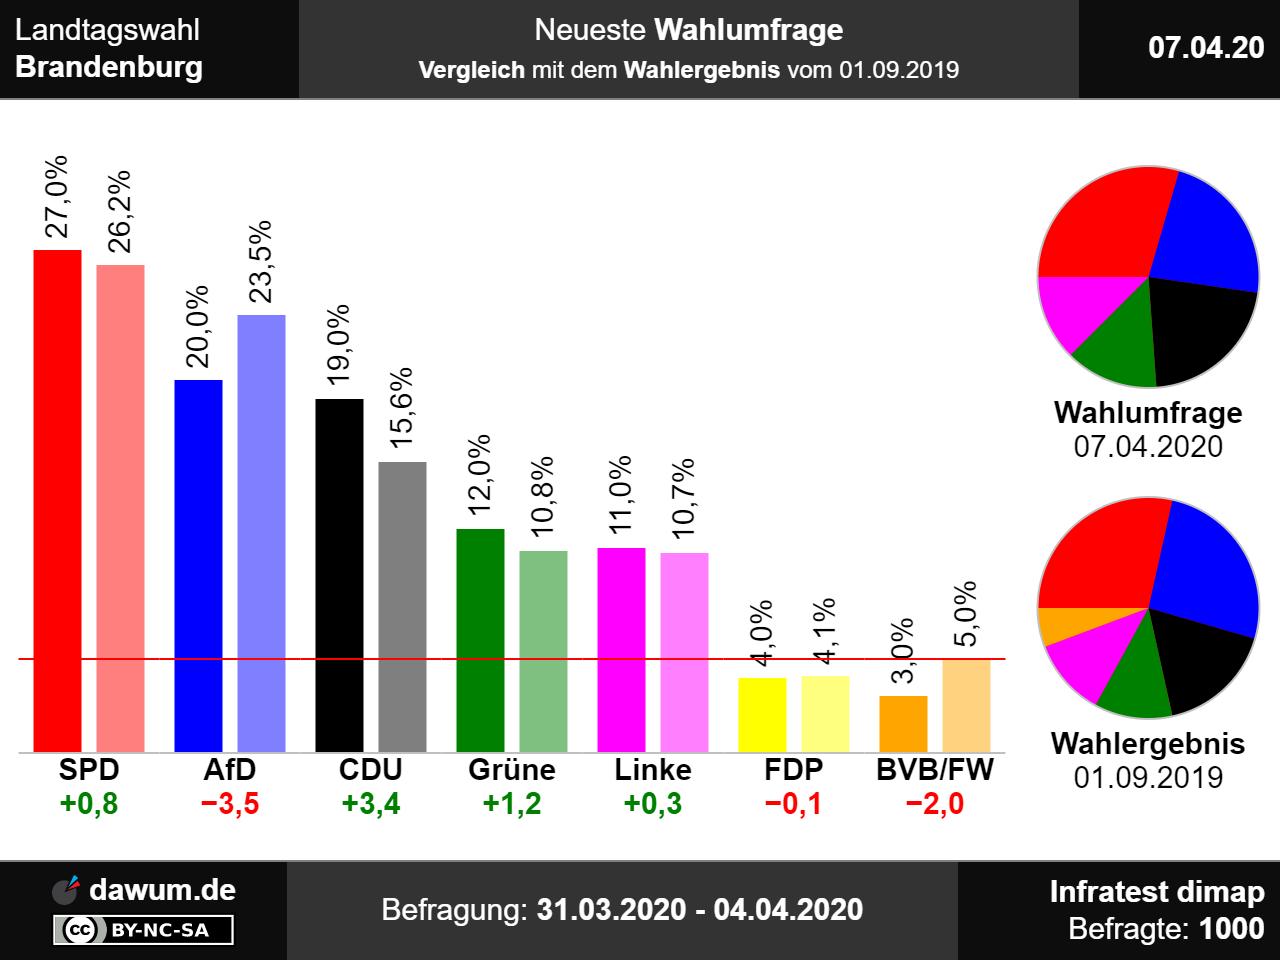 landtagswahlen brandenburg 2019